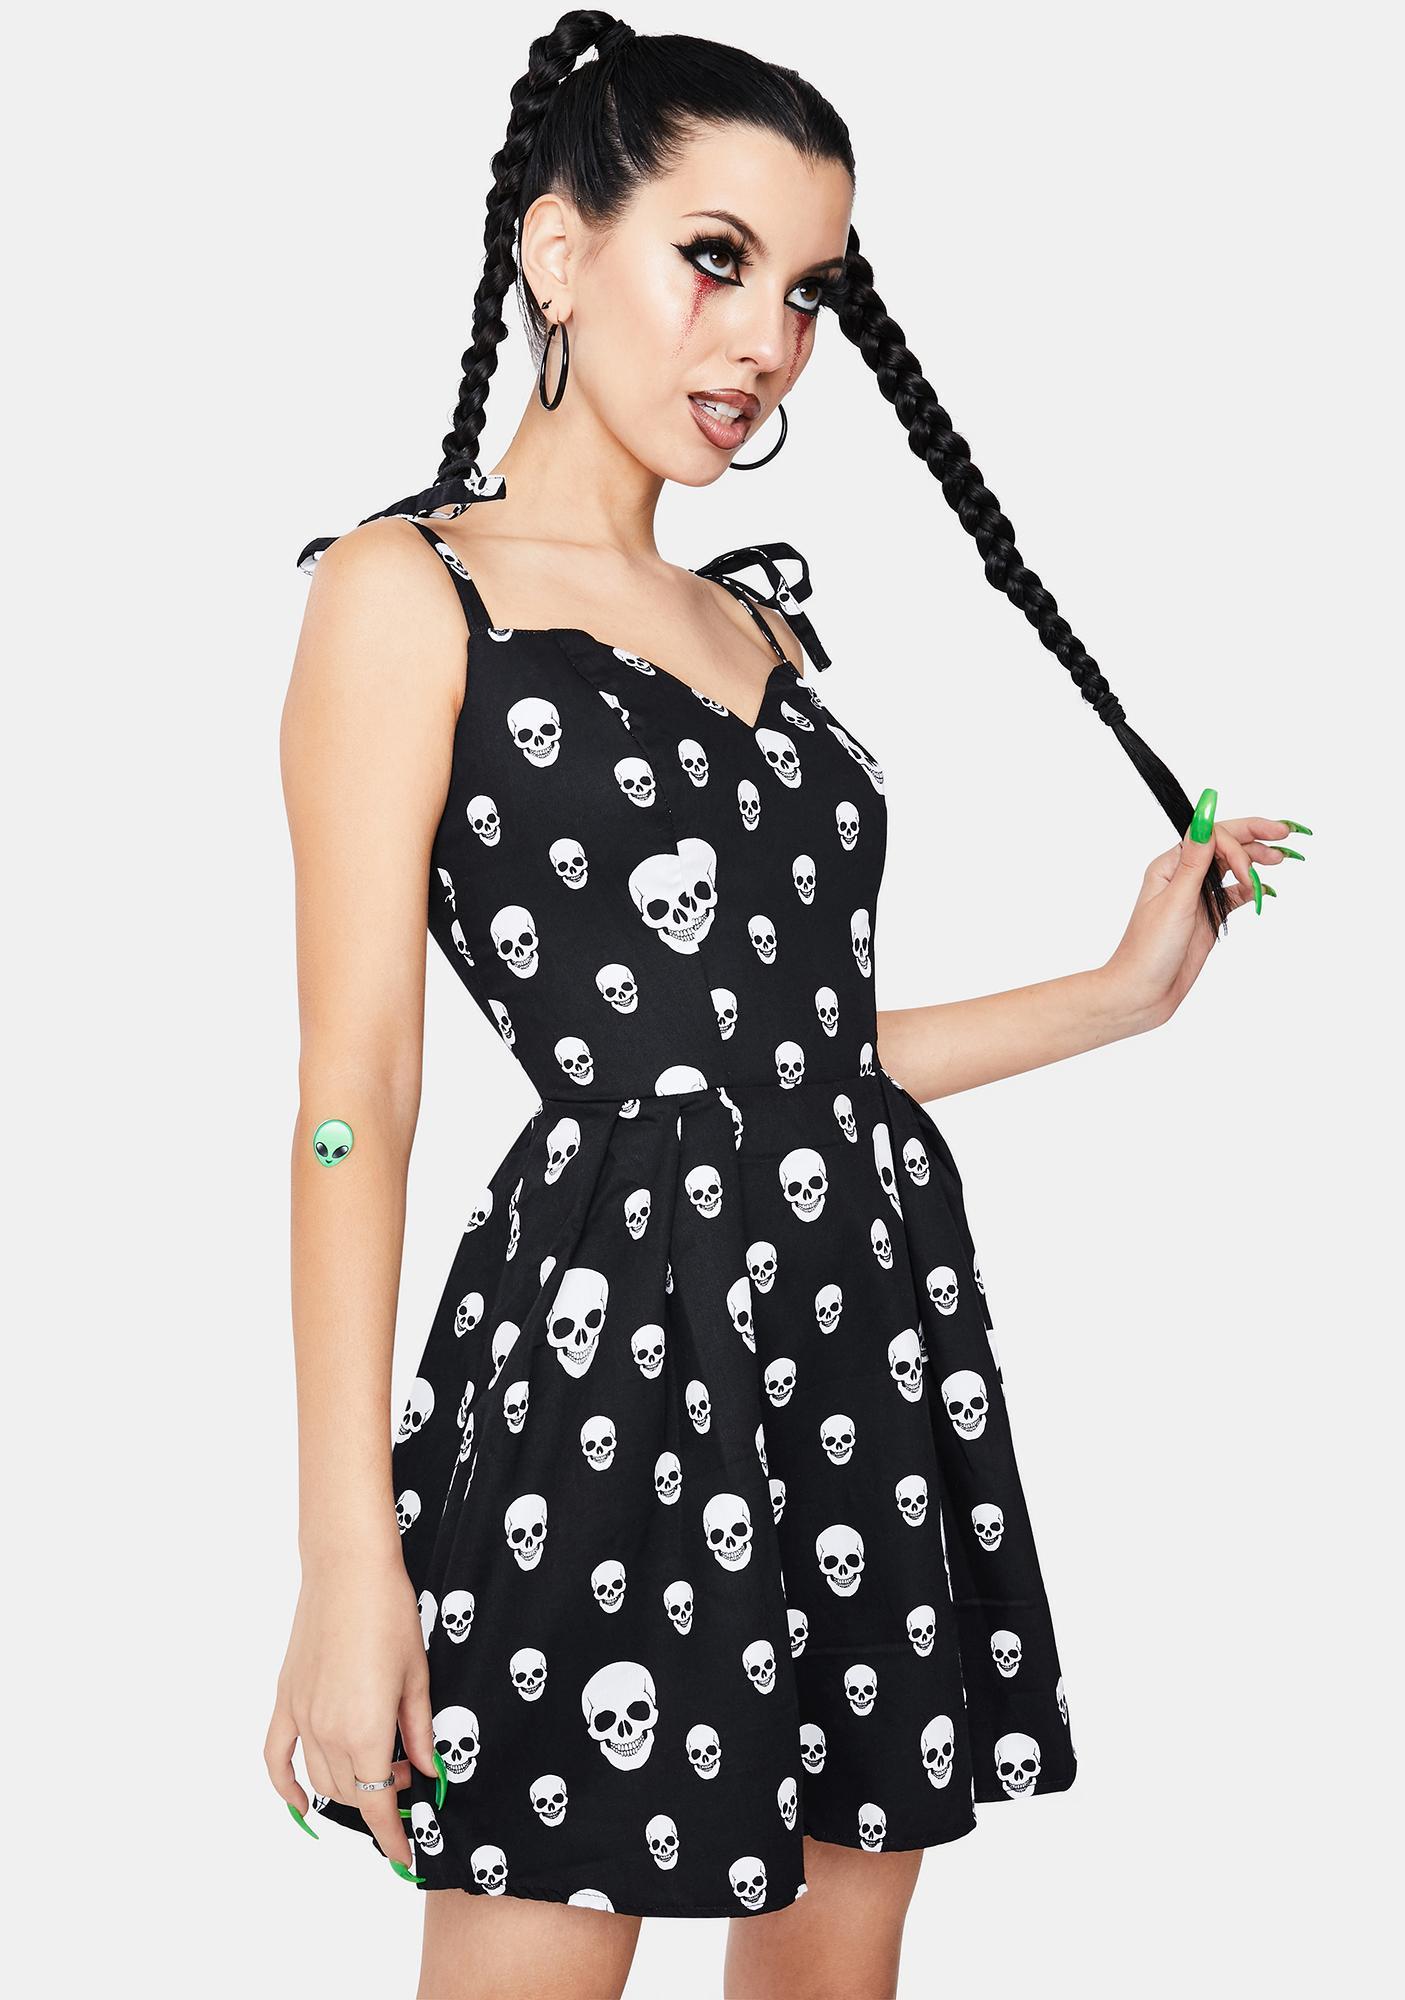 Dr. Faust Corrie Spooky Skulls Mini Dress